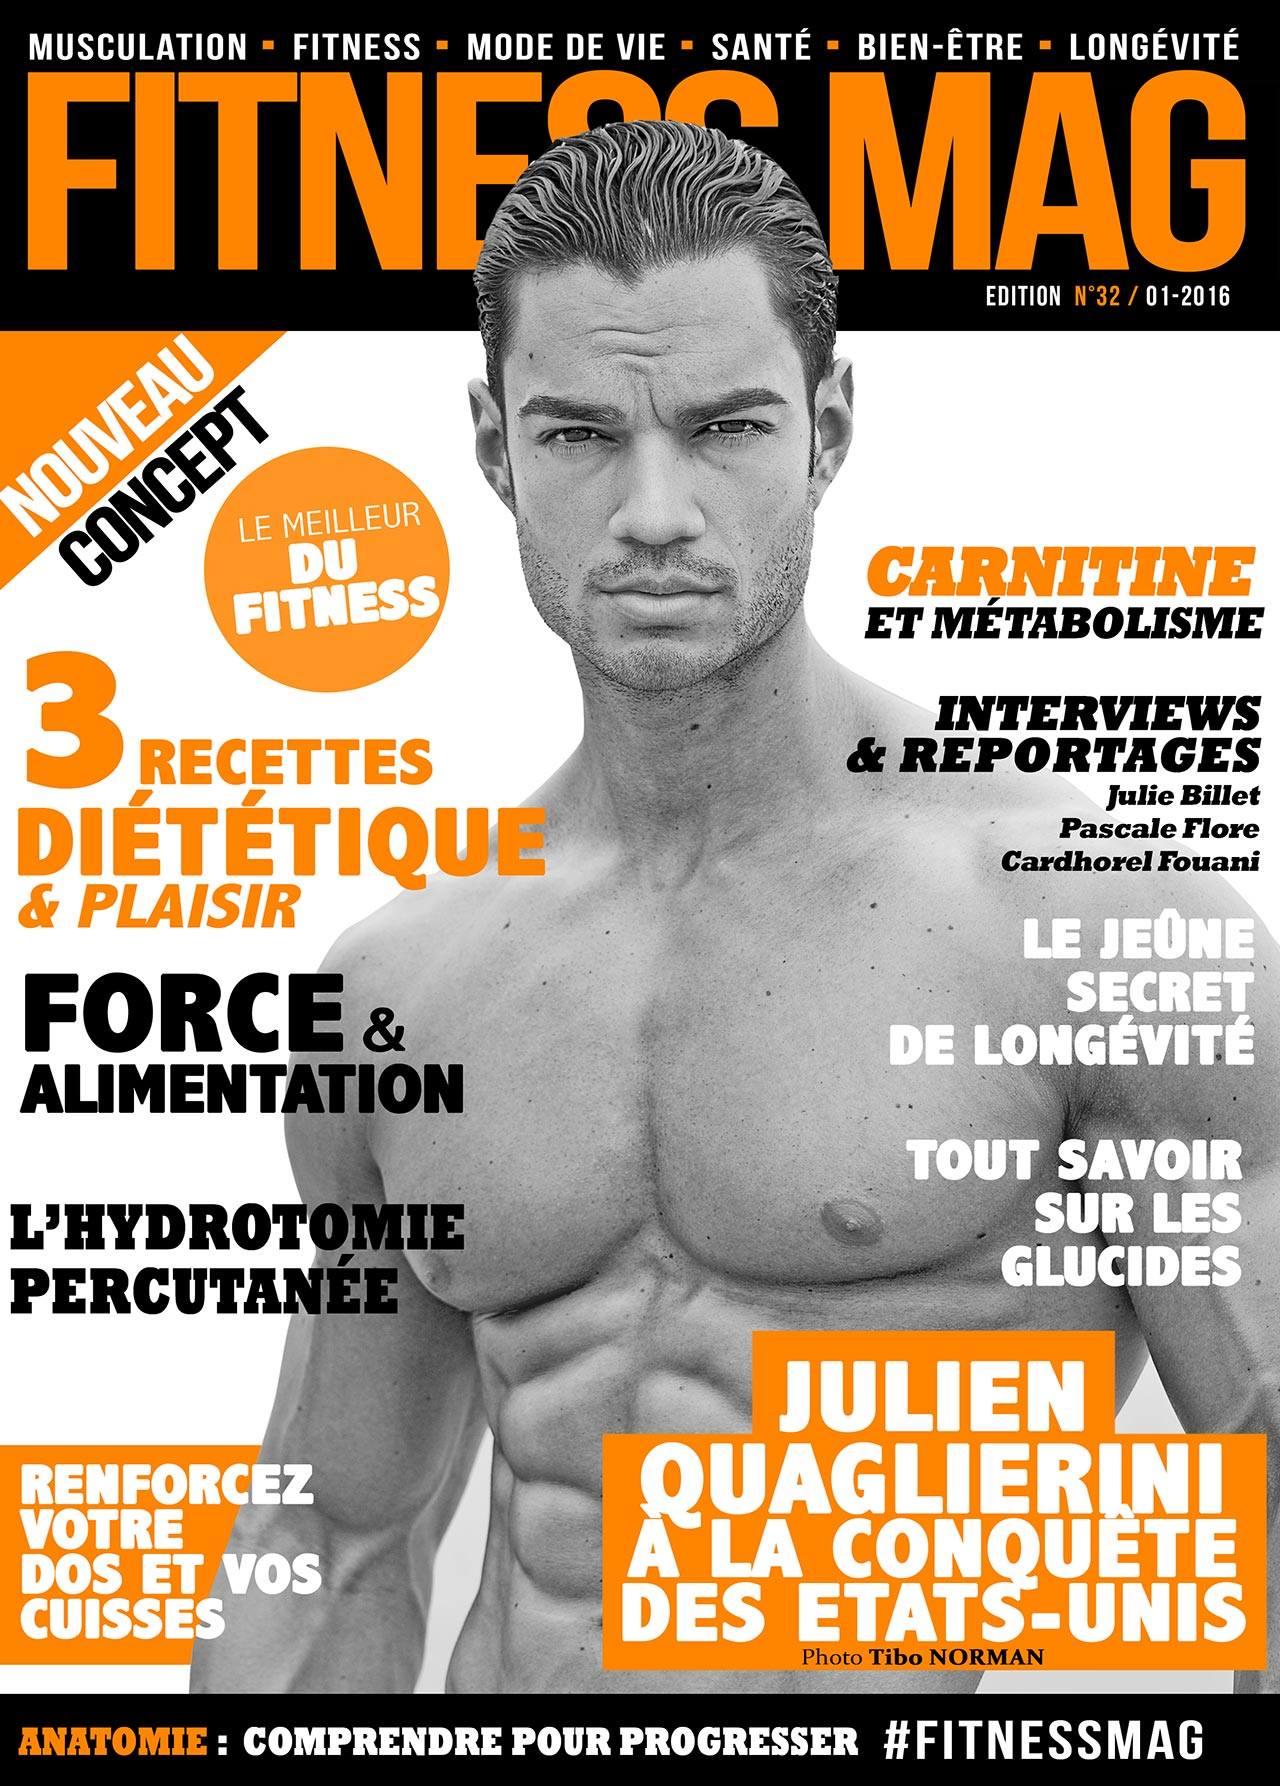 Fitness Mag (cover model: Julien Quaglierini)